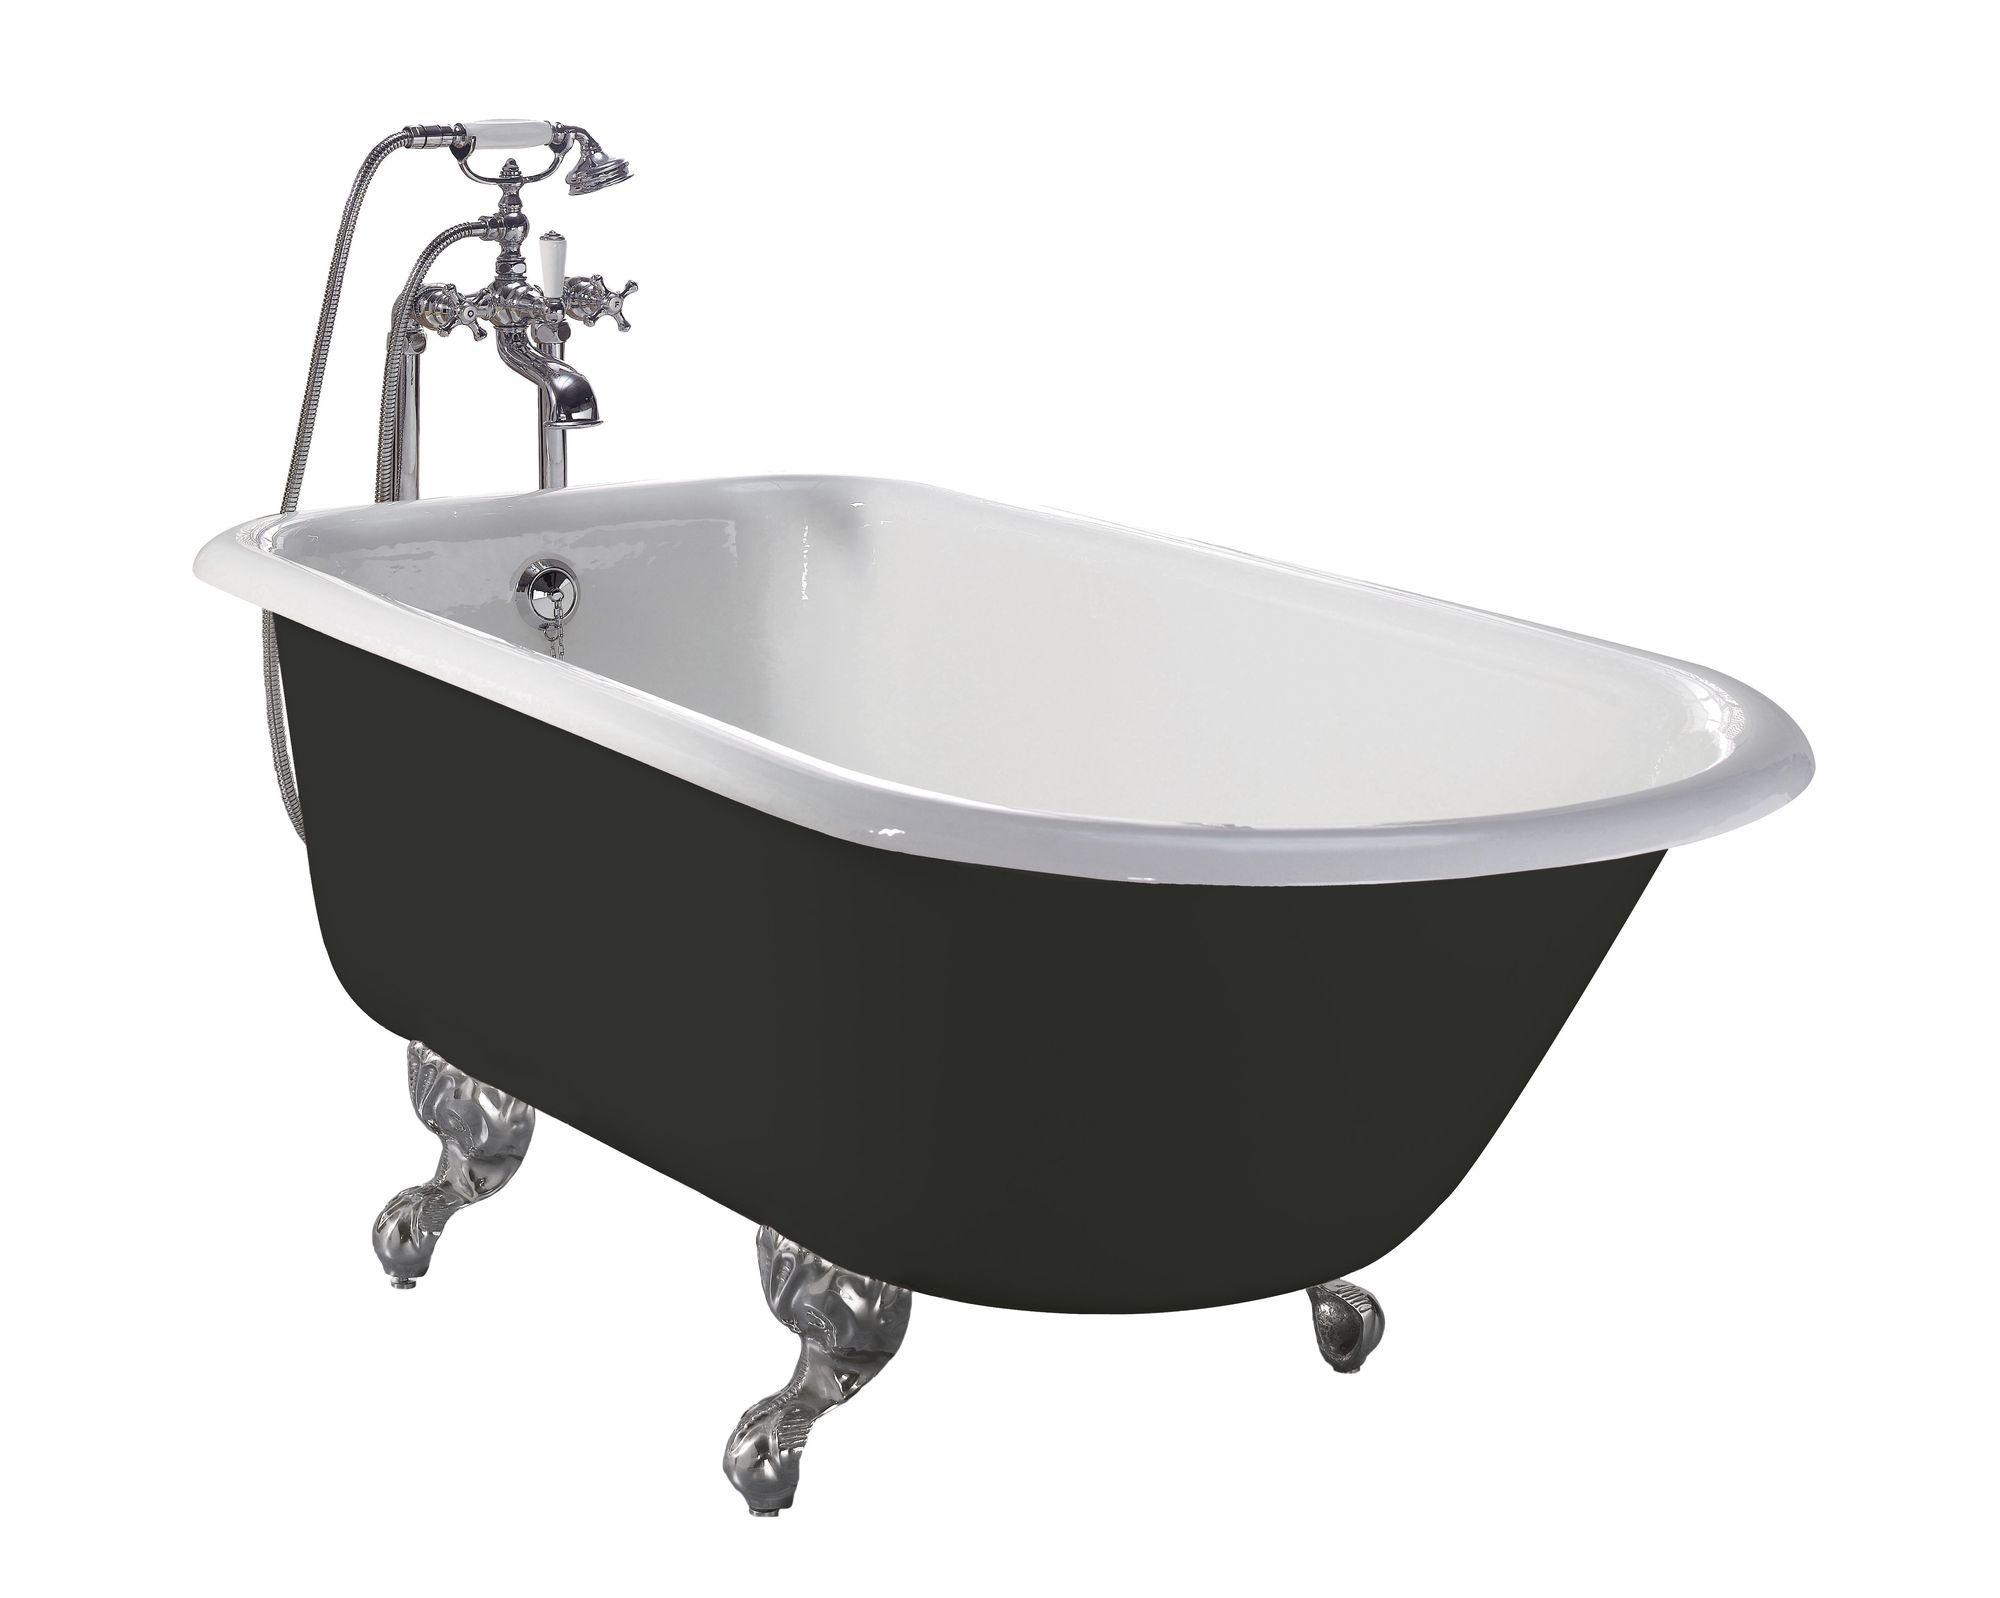 Freistehende Gusseisenbadewanne Traditional Bathrooms Vintage Badewanne Vintagebad Vintage Bad Vint Gusseisen Badewanne Viktorianisches Badezimmer Wanne